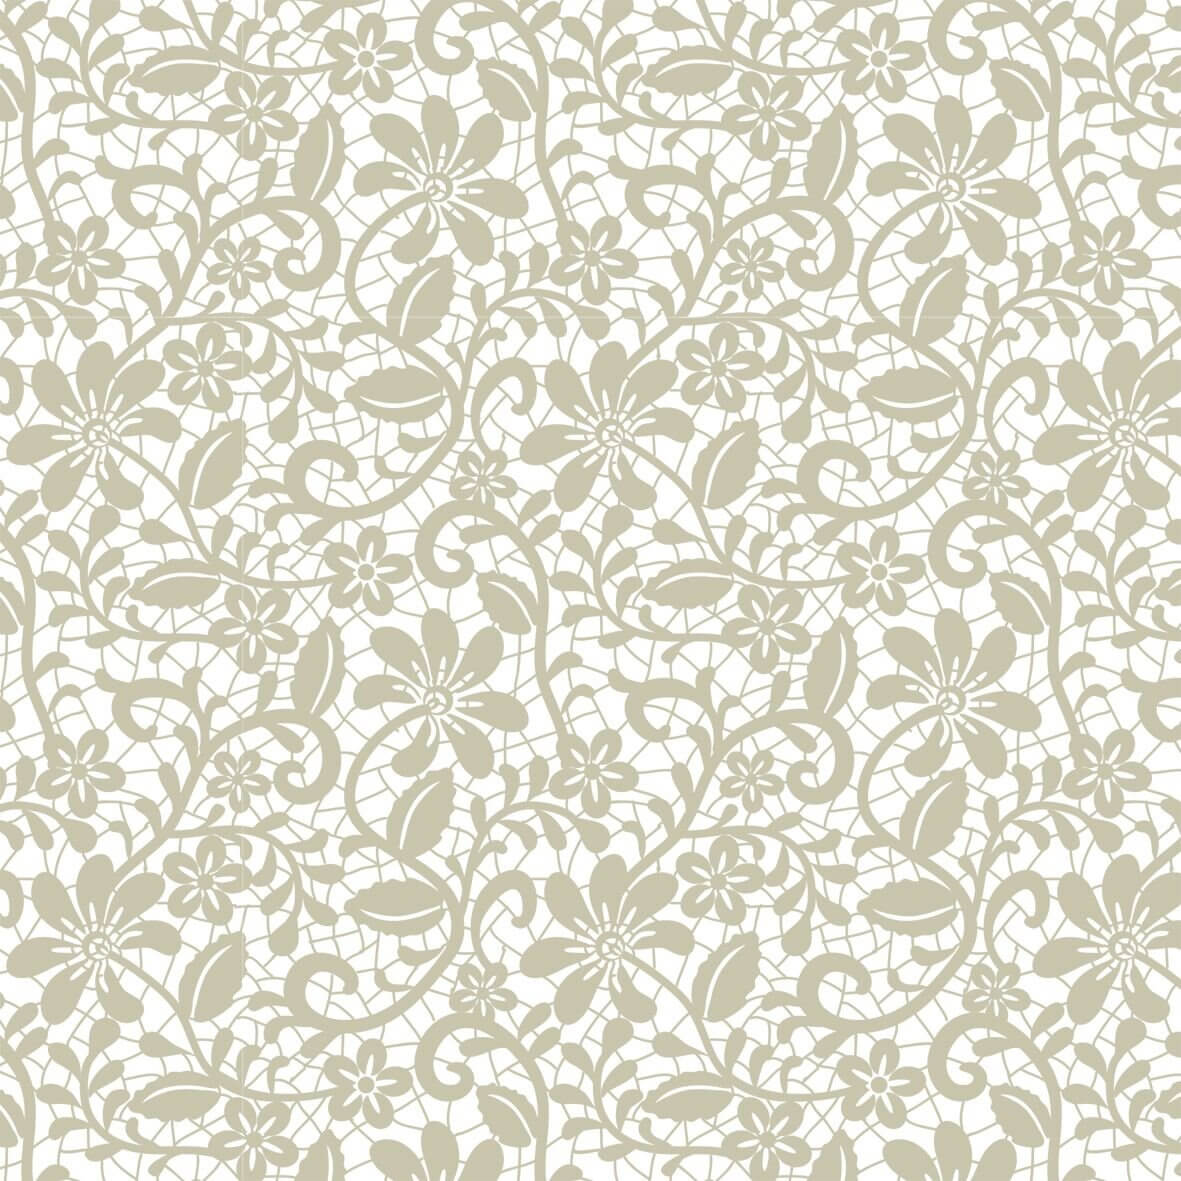 Honiton de Jour Decorative A4 Paper - Zoom